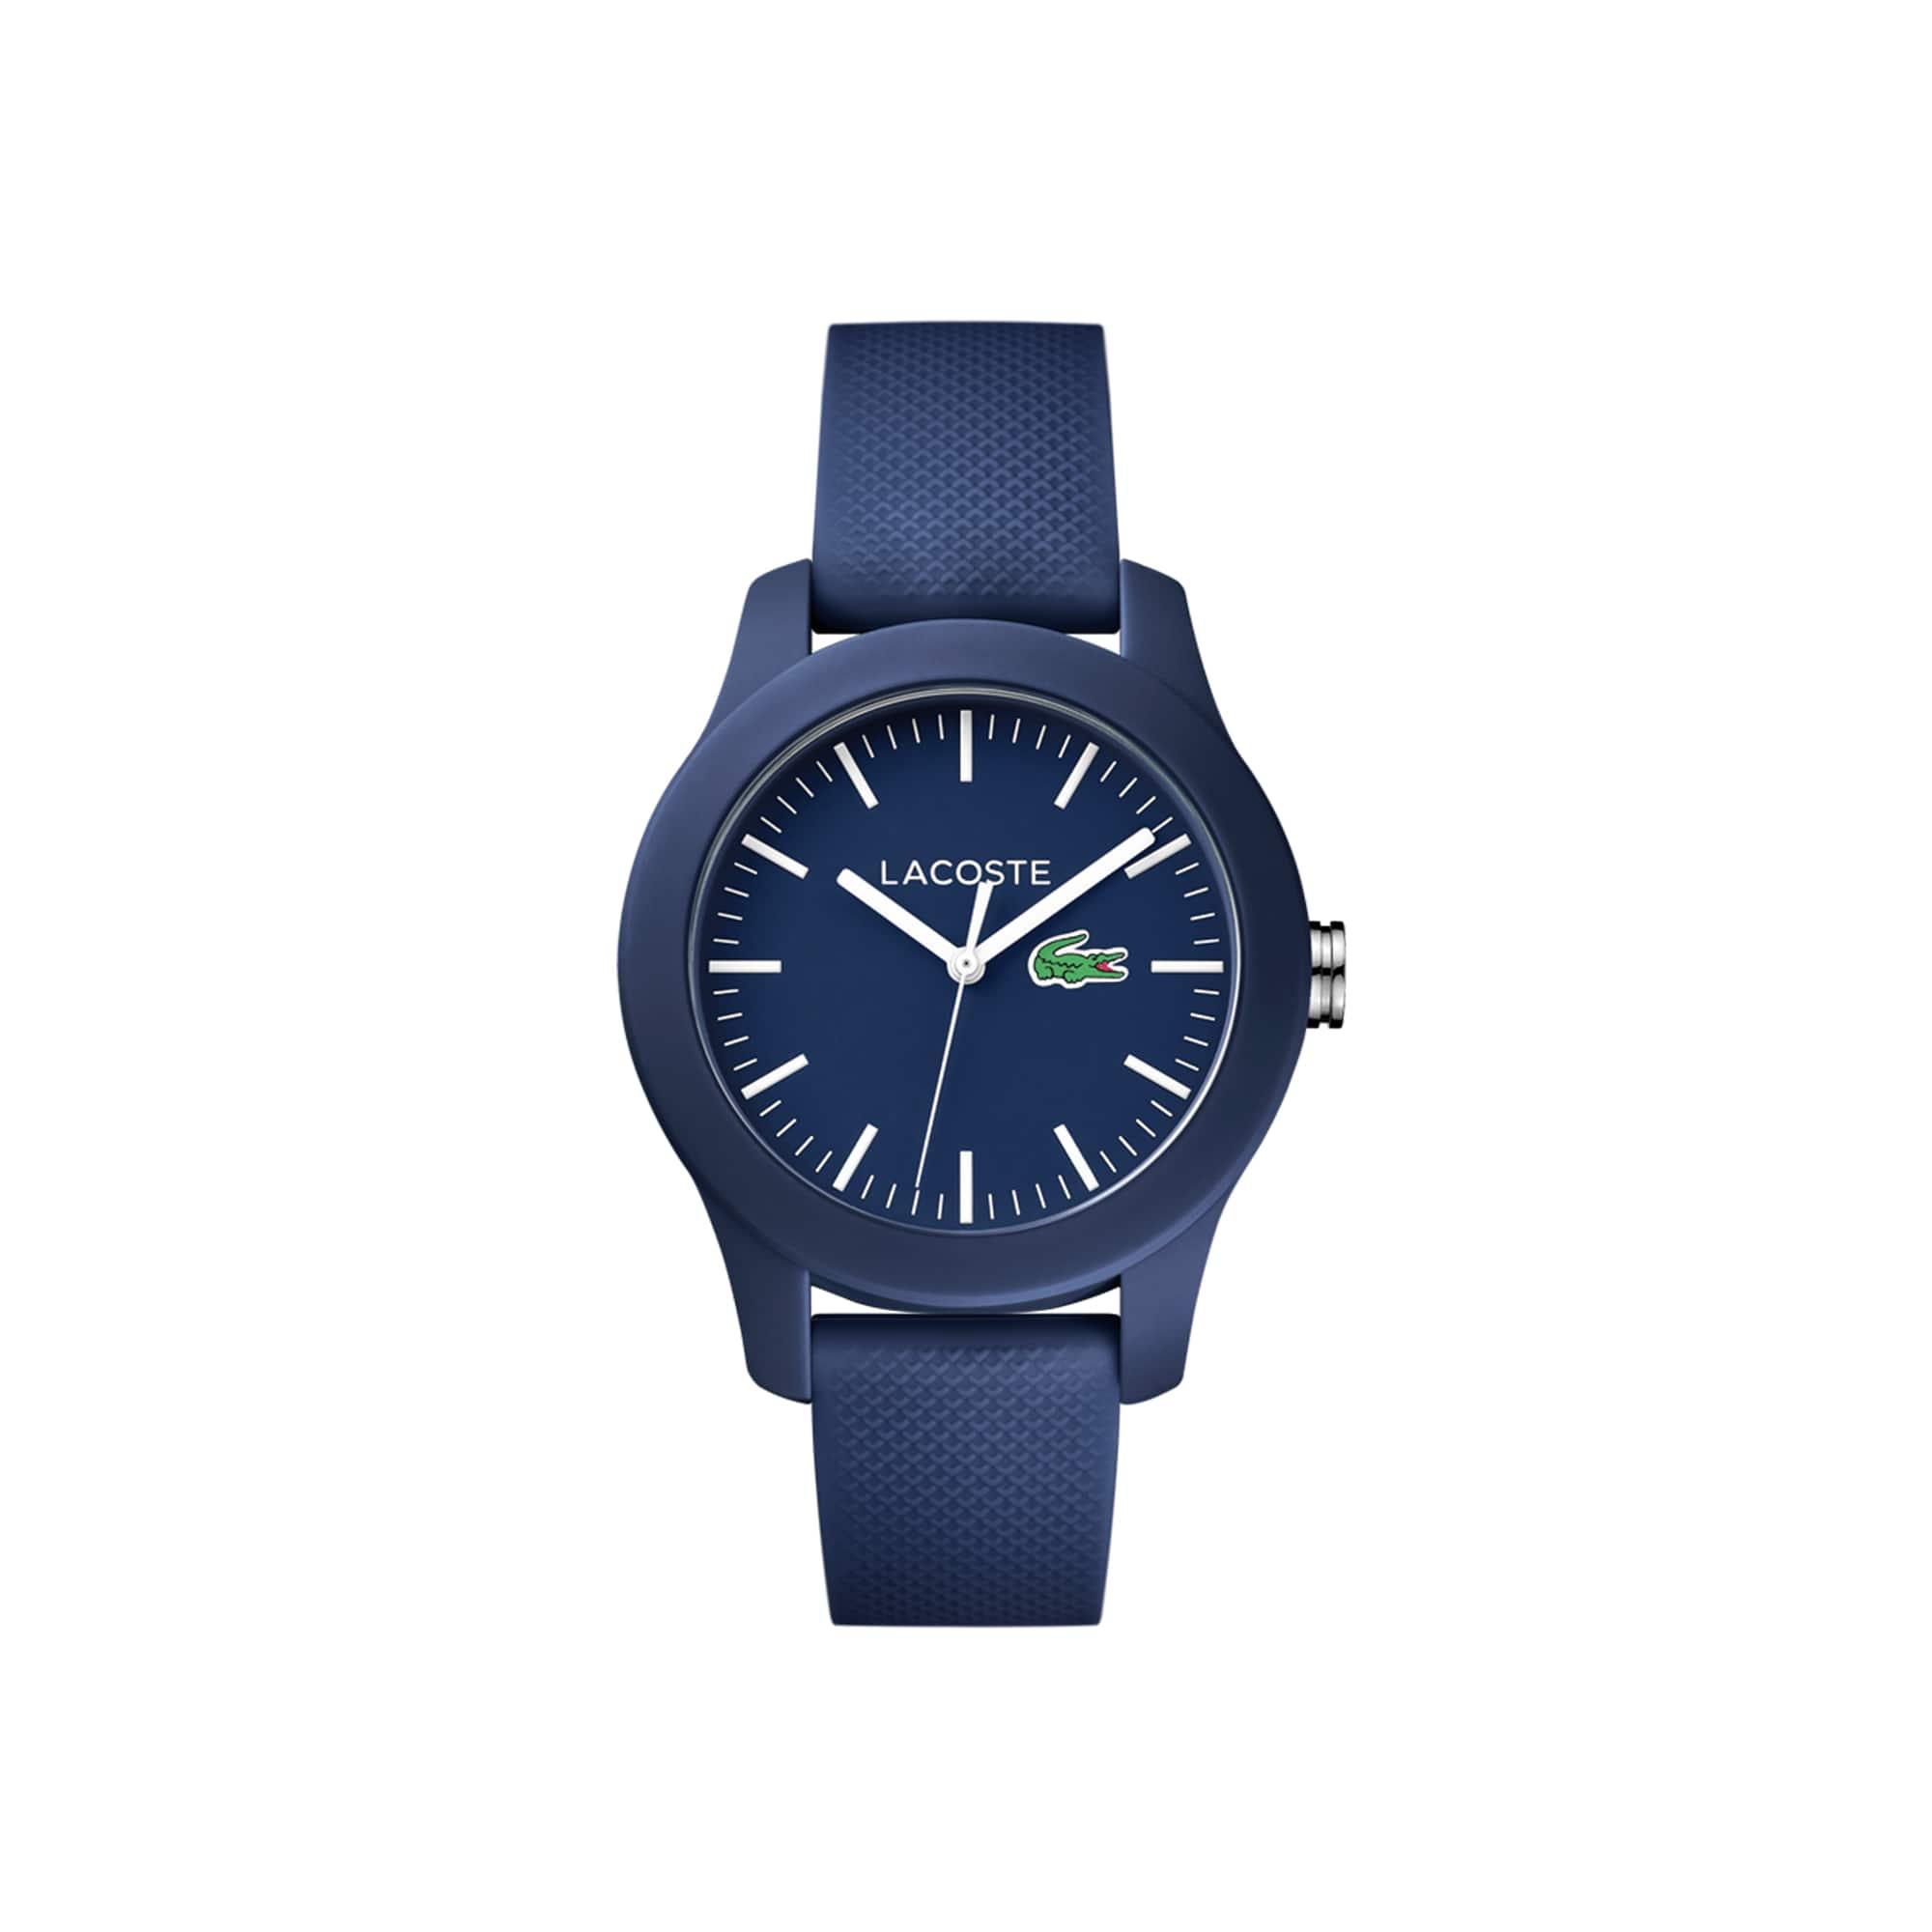 Relógio Lacoste 12.12 de mulher com bracelete de silicone azul